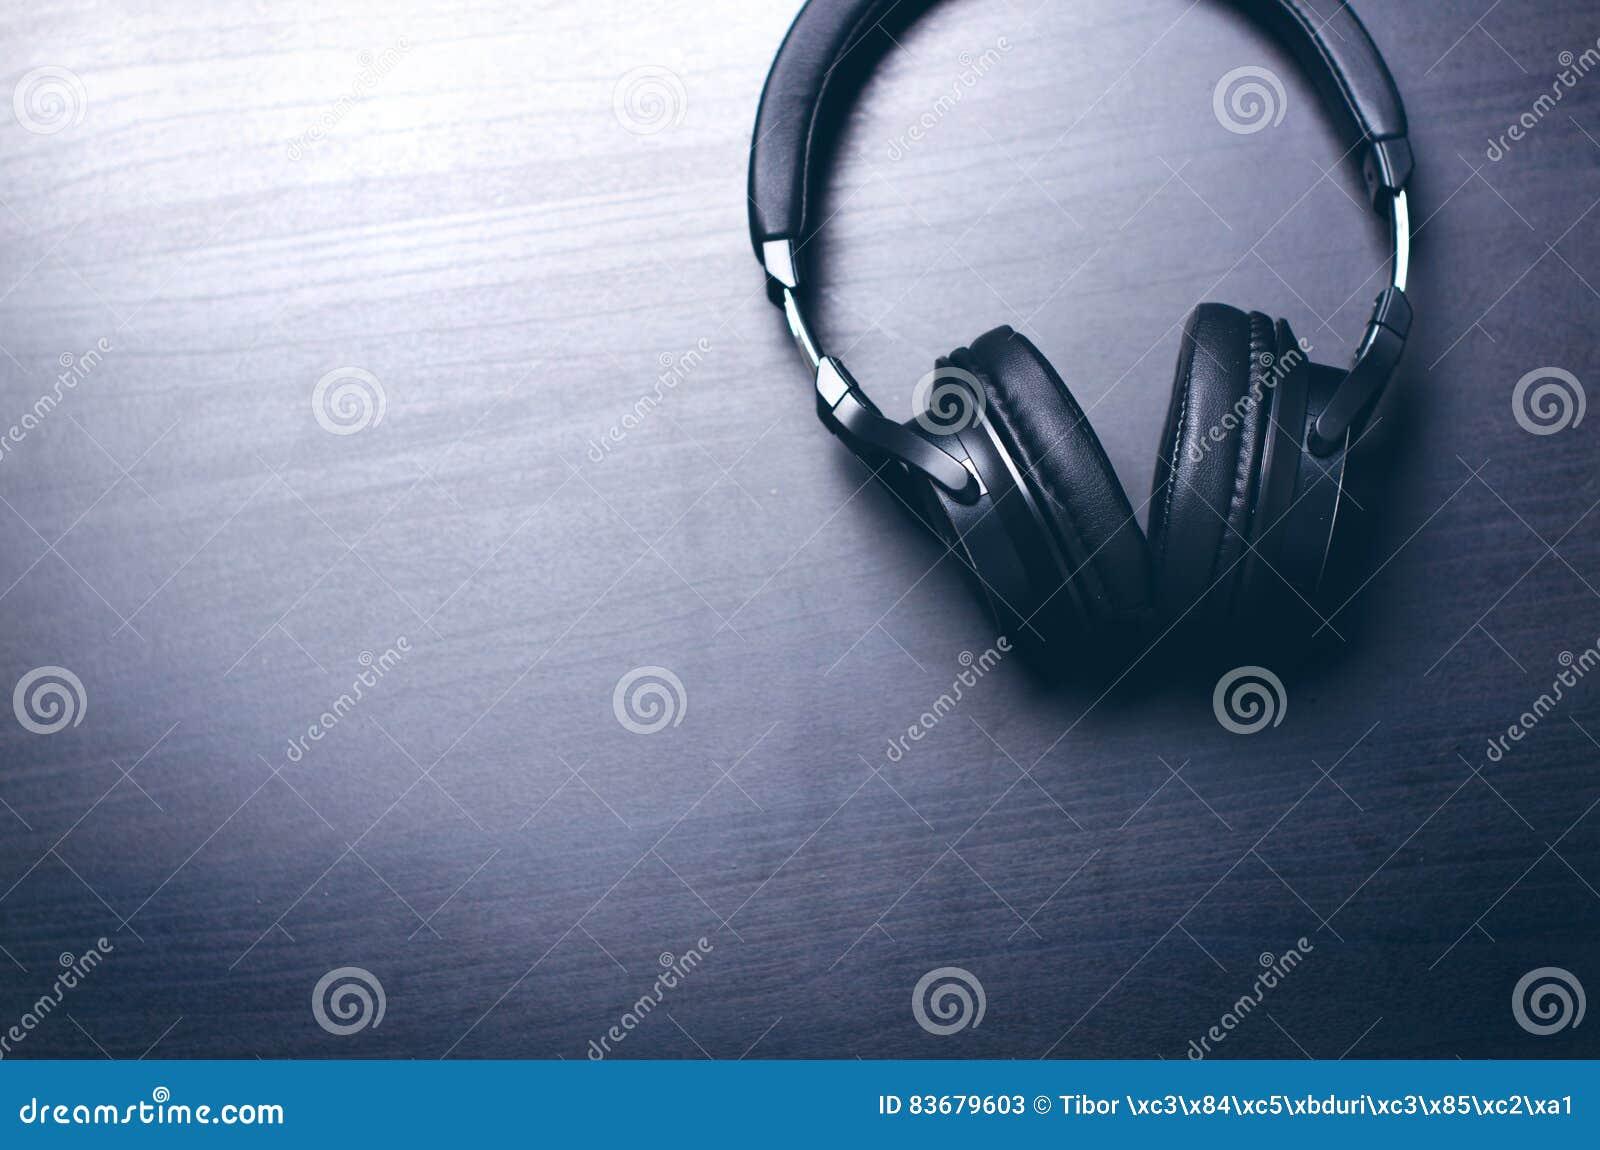 Headphones Music Microphones 4500x4100 Wallpaper: Headphones On A Dark Background. Music Accessories